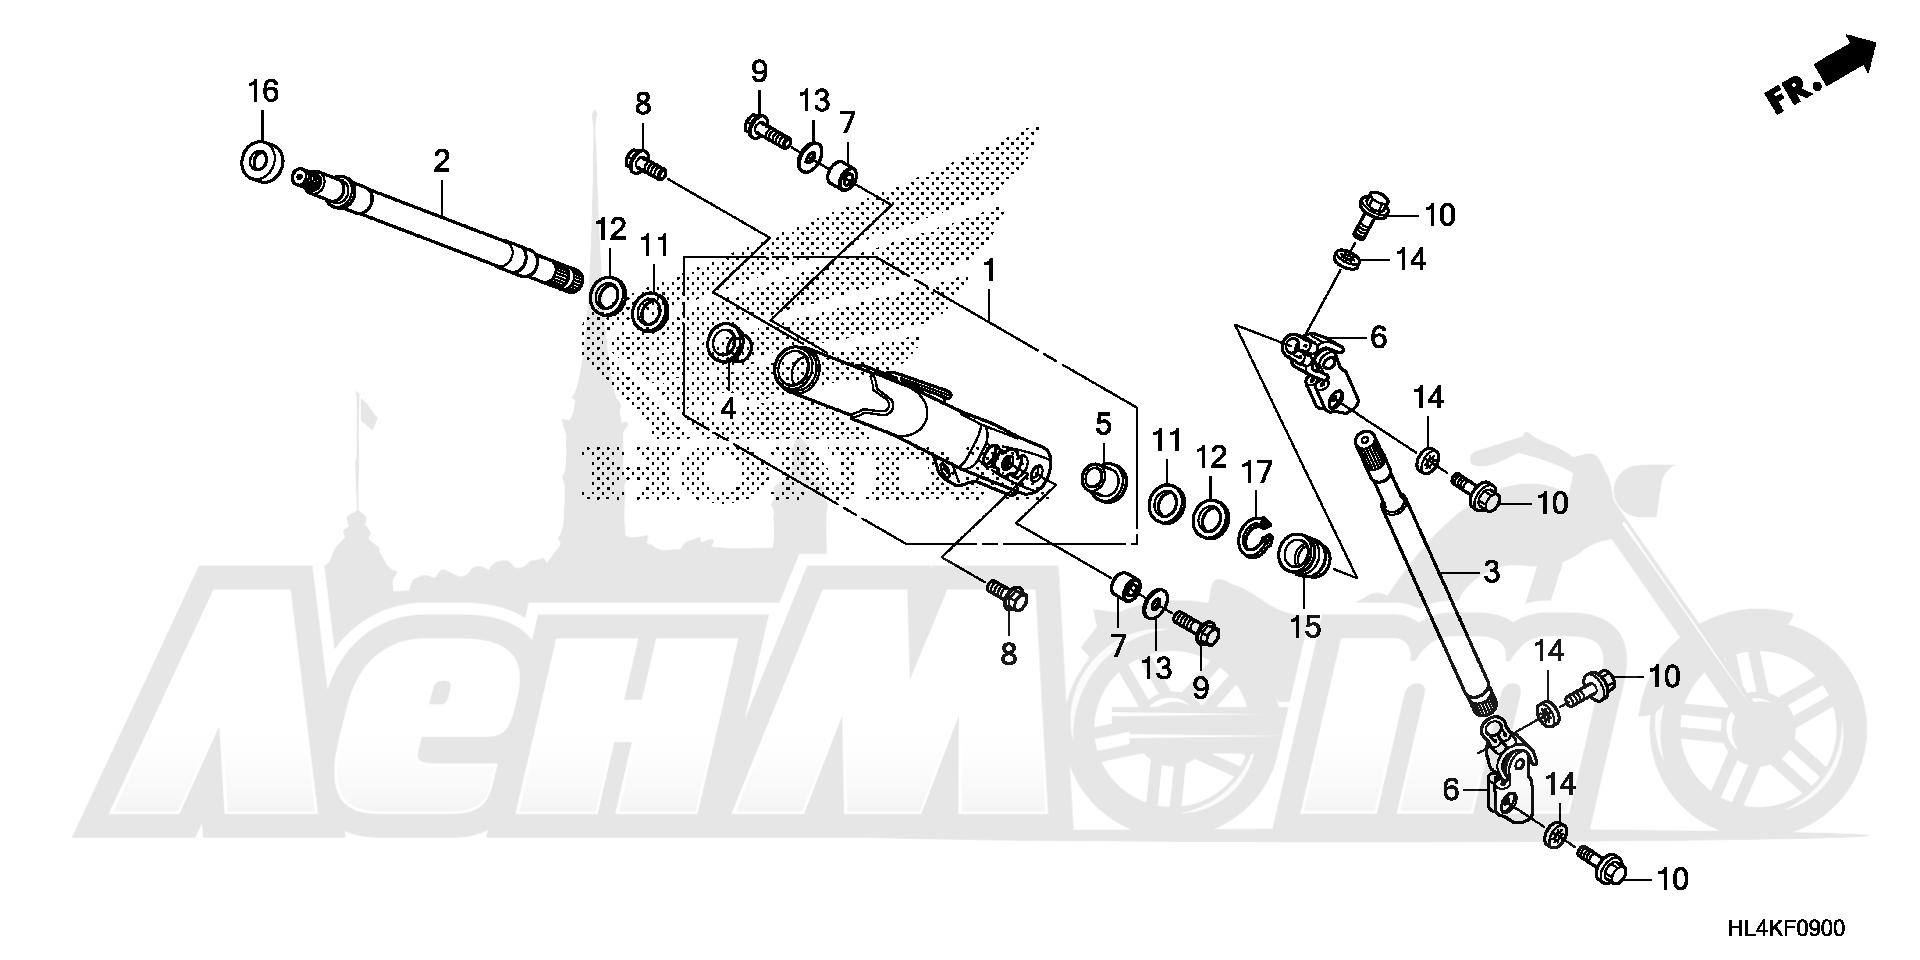 Запчасти для Квадроцикла Honda 2019 SXS1000M3L Раздел: STEERING SHAFT | рулевой вал